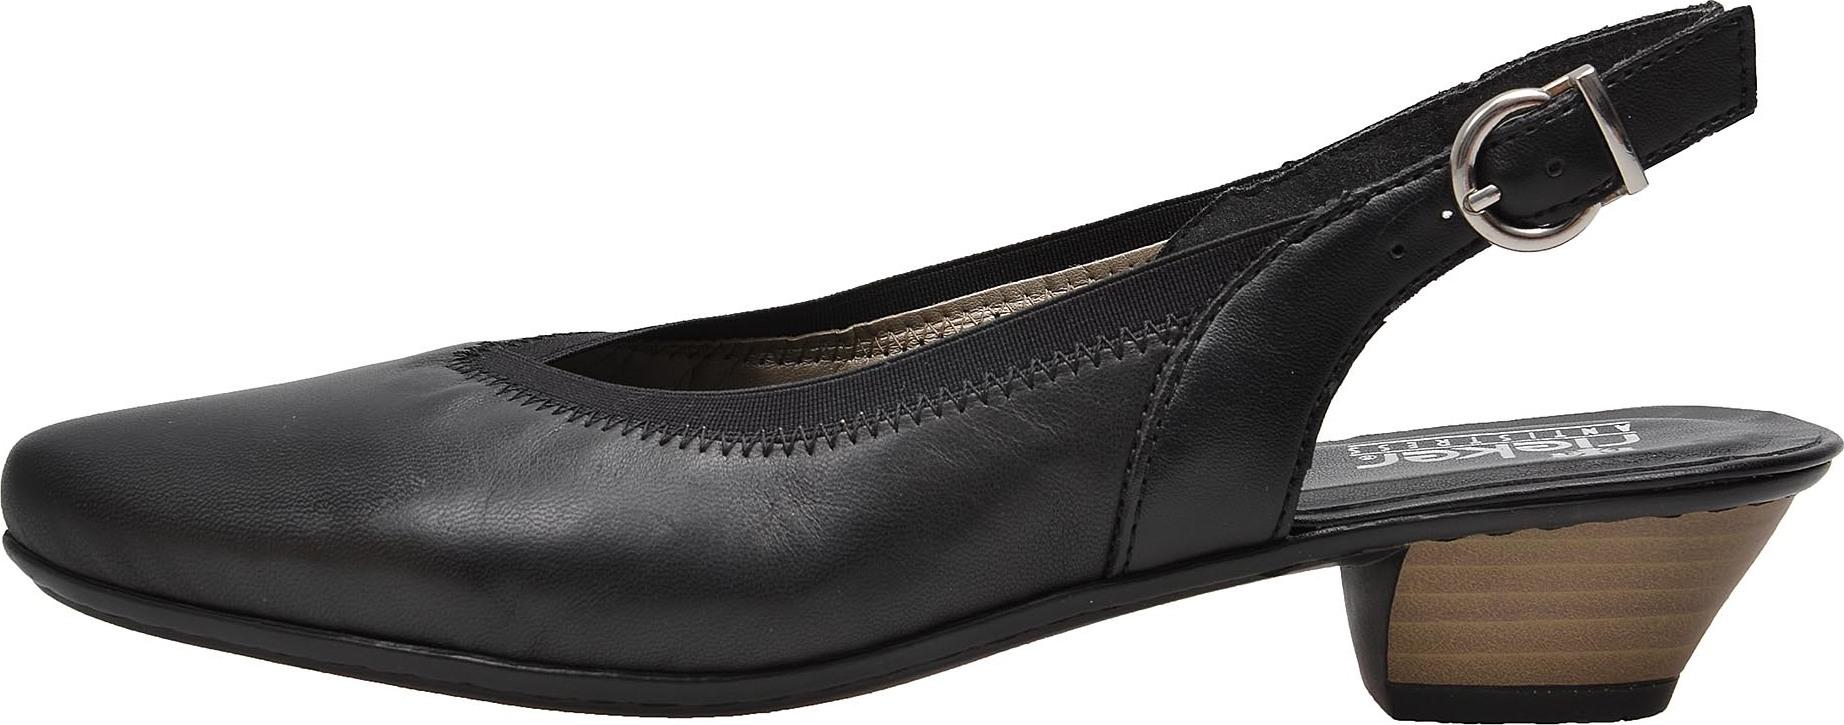 f4a22c14cc88 Dámská obuv RIEKER 58063 00 SCHWARZ F S 8 – Rieker Antistress